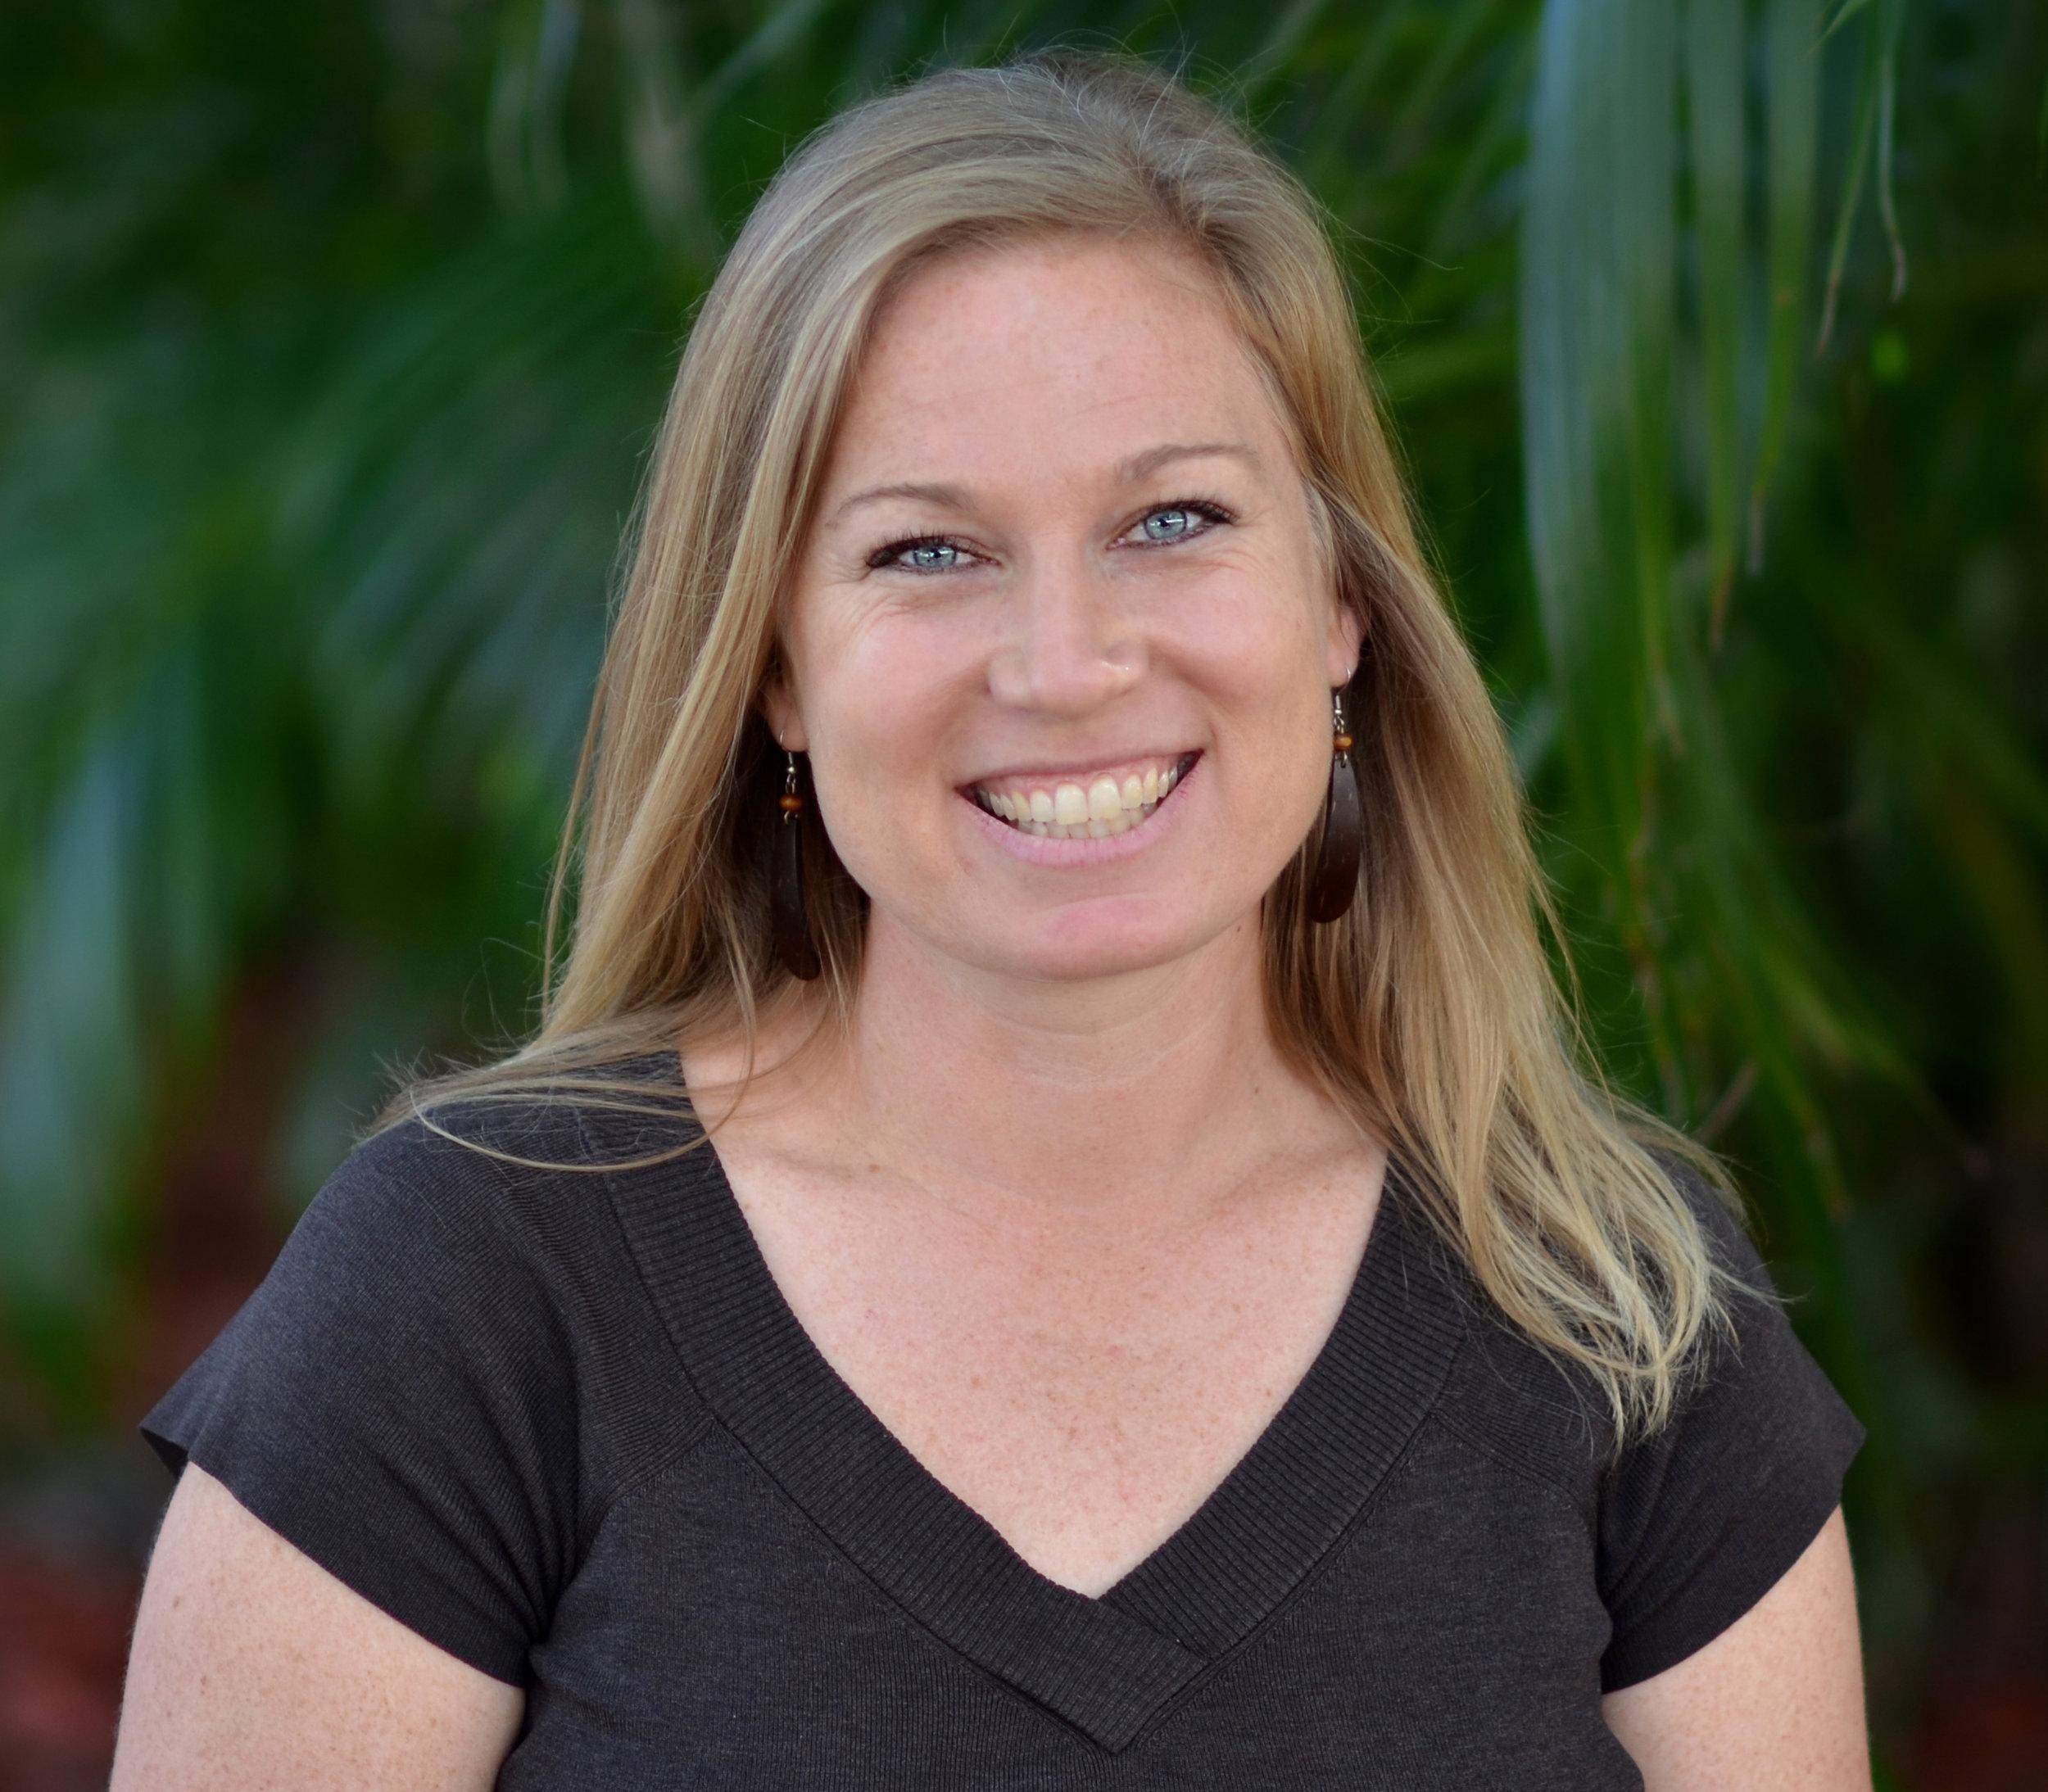 Christa Jewett - Founder, Saltwater Studies, Inc.